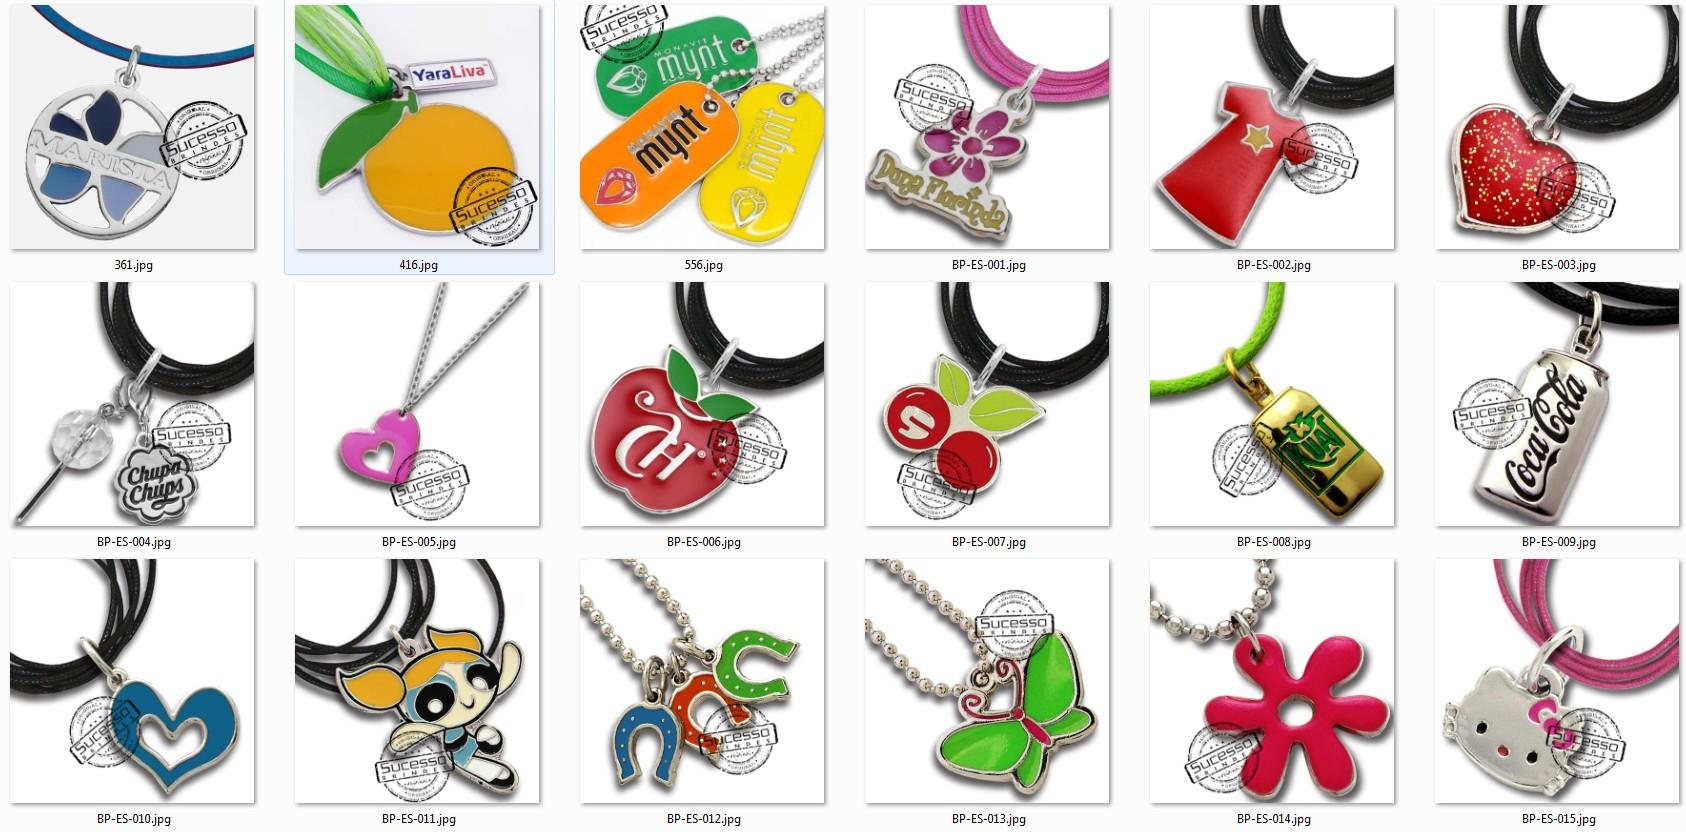 bijuteria promocional personalizada anel pulseira corrente pingente 3